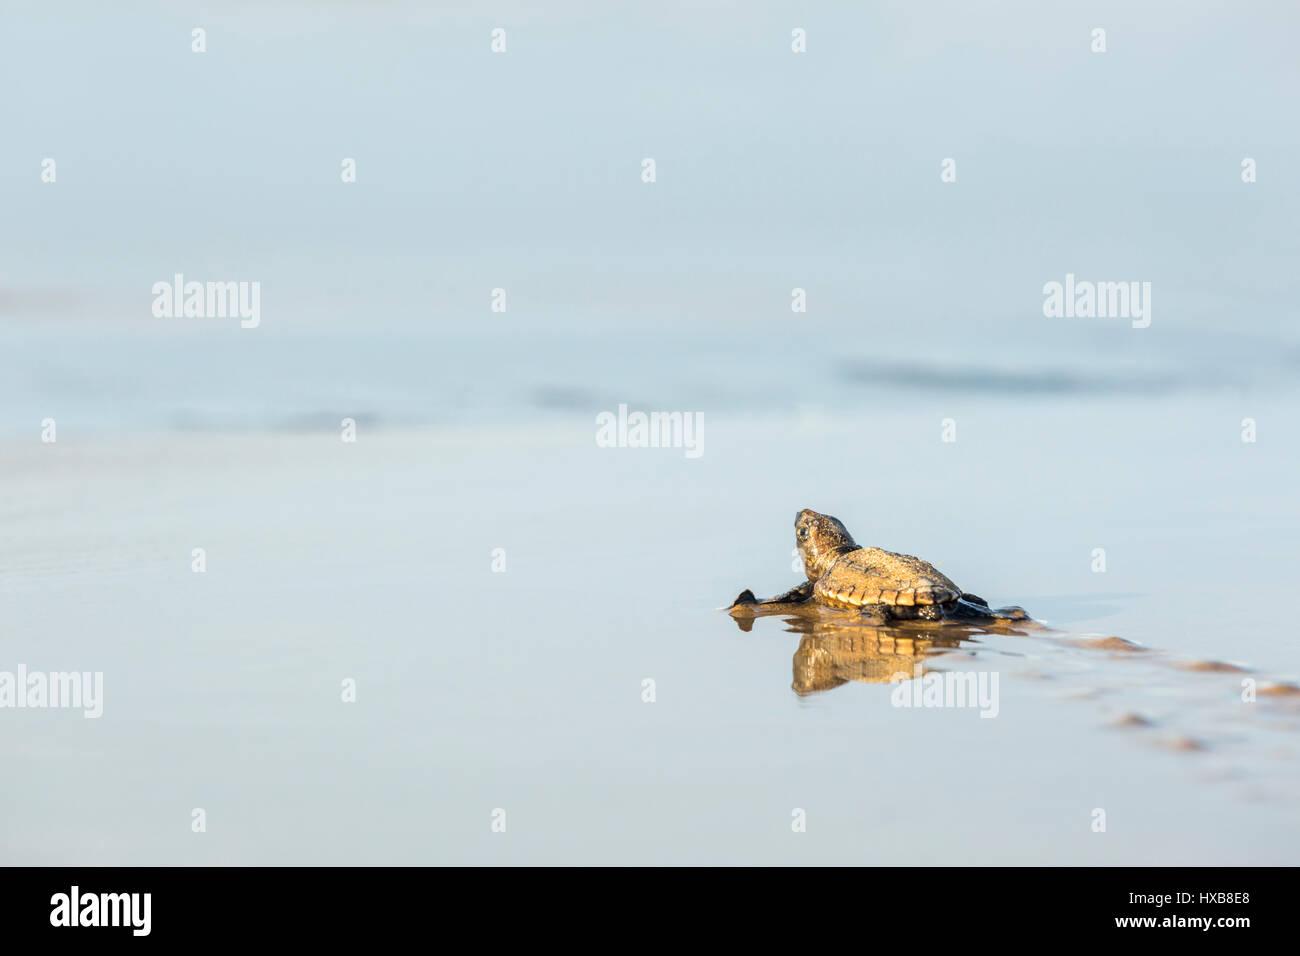 Baby loggerhead turtle (Caretta caretta) making its journey to the sea.   Mon Repos Conservation Park, Bundaberg, Stock Photo